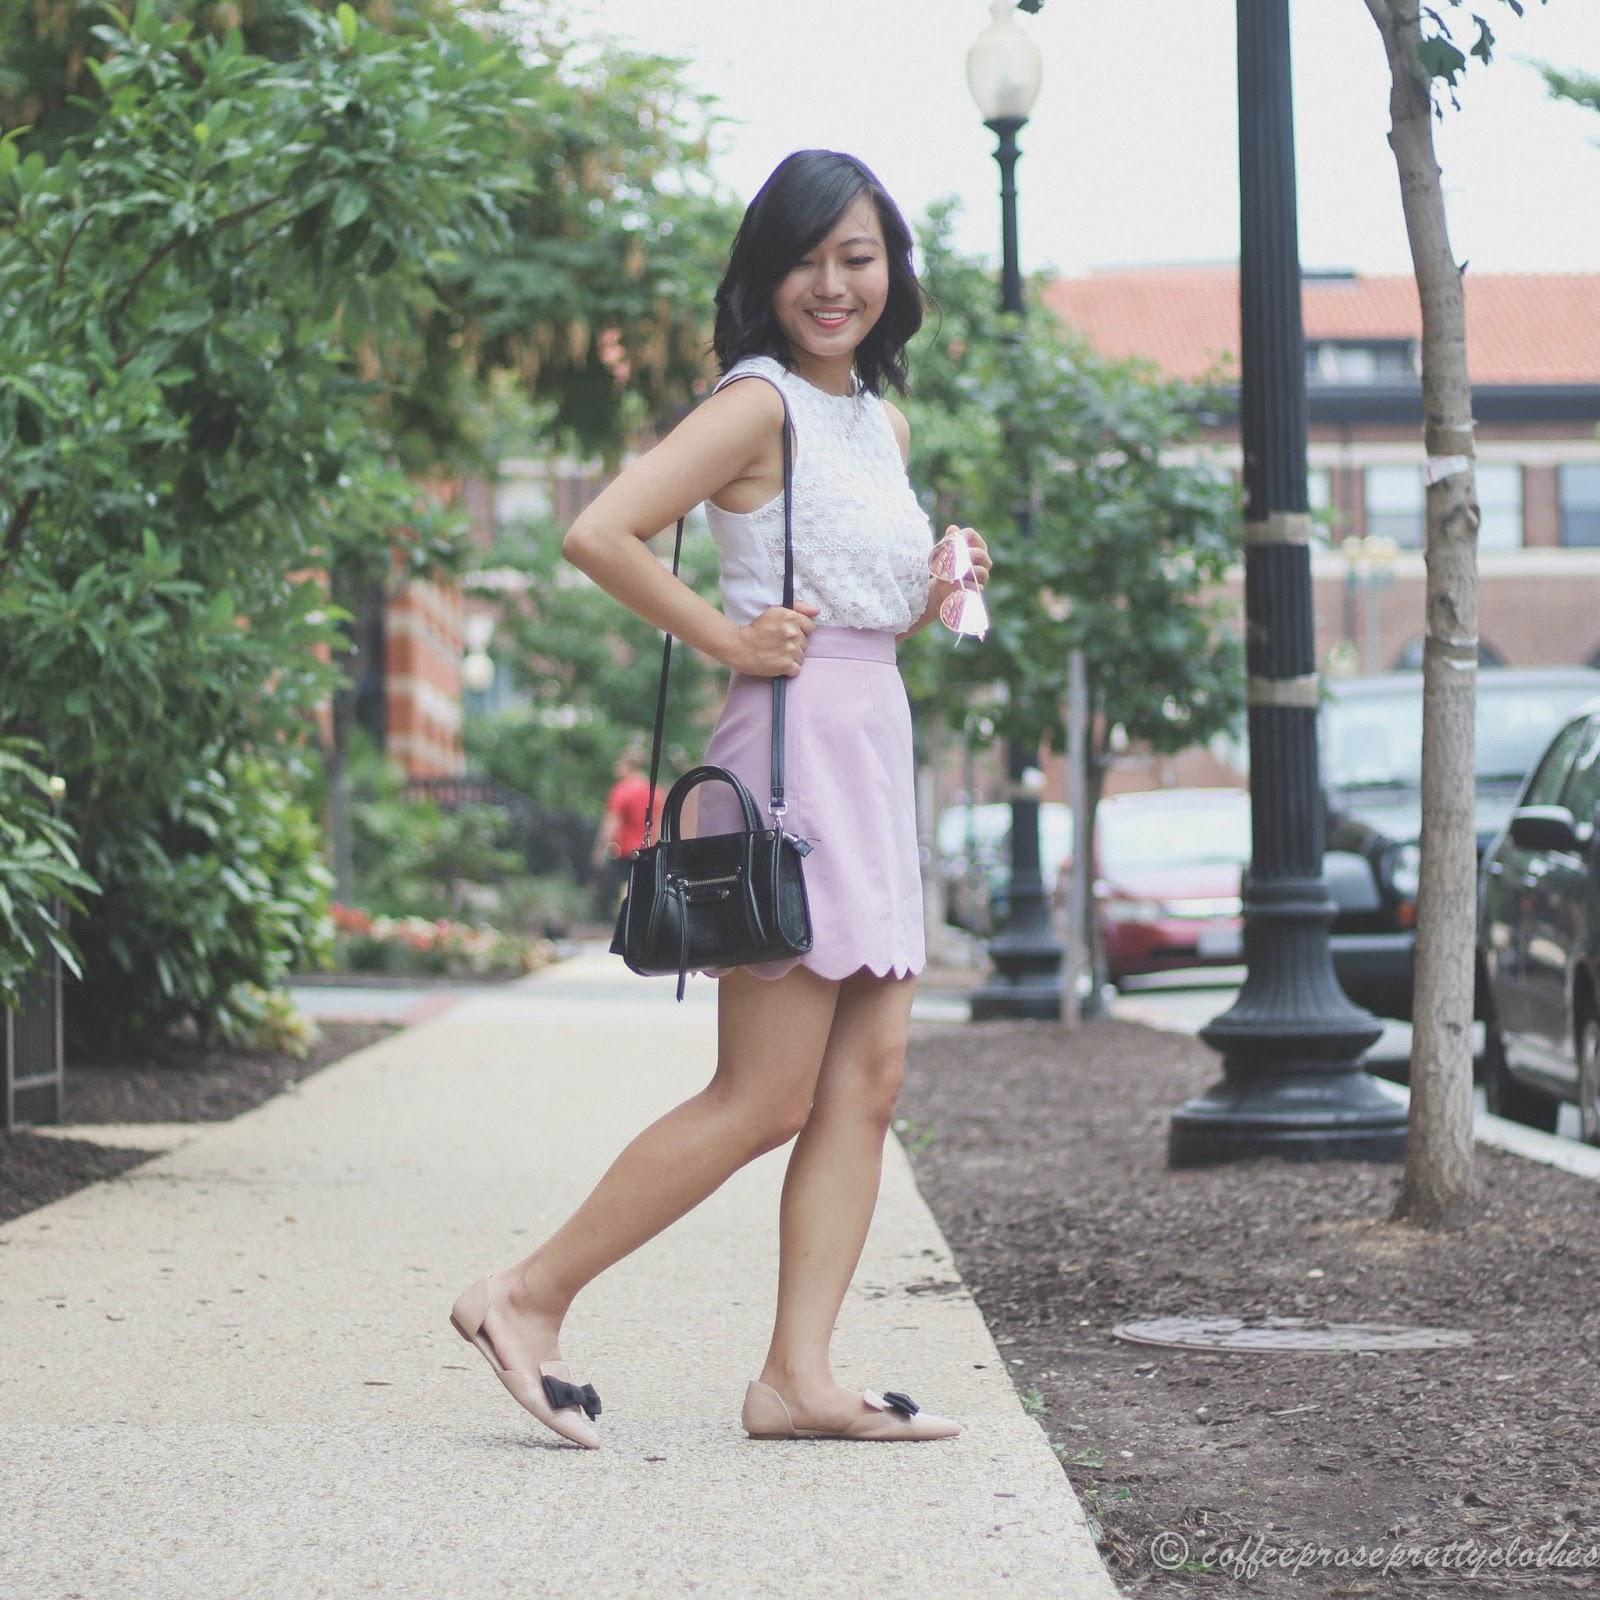 Crochet tank, scalloped skirt, nude mules